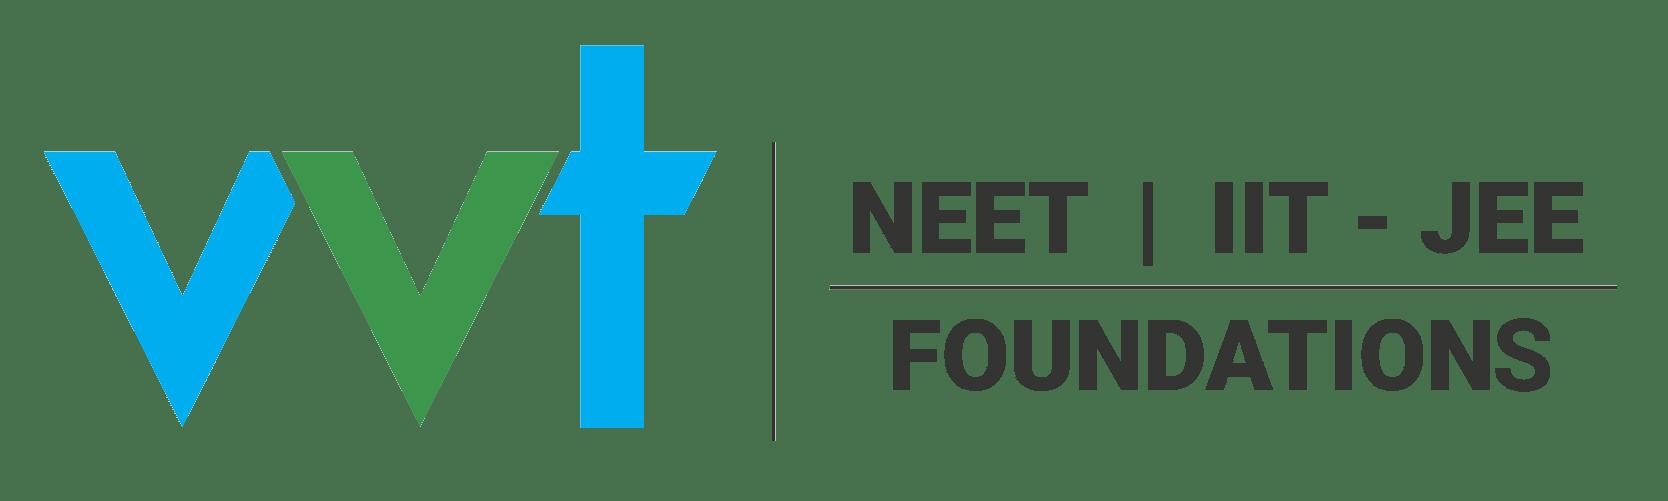 VVT NEET IIT-JEE Foundations Logo